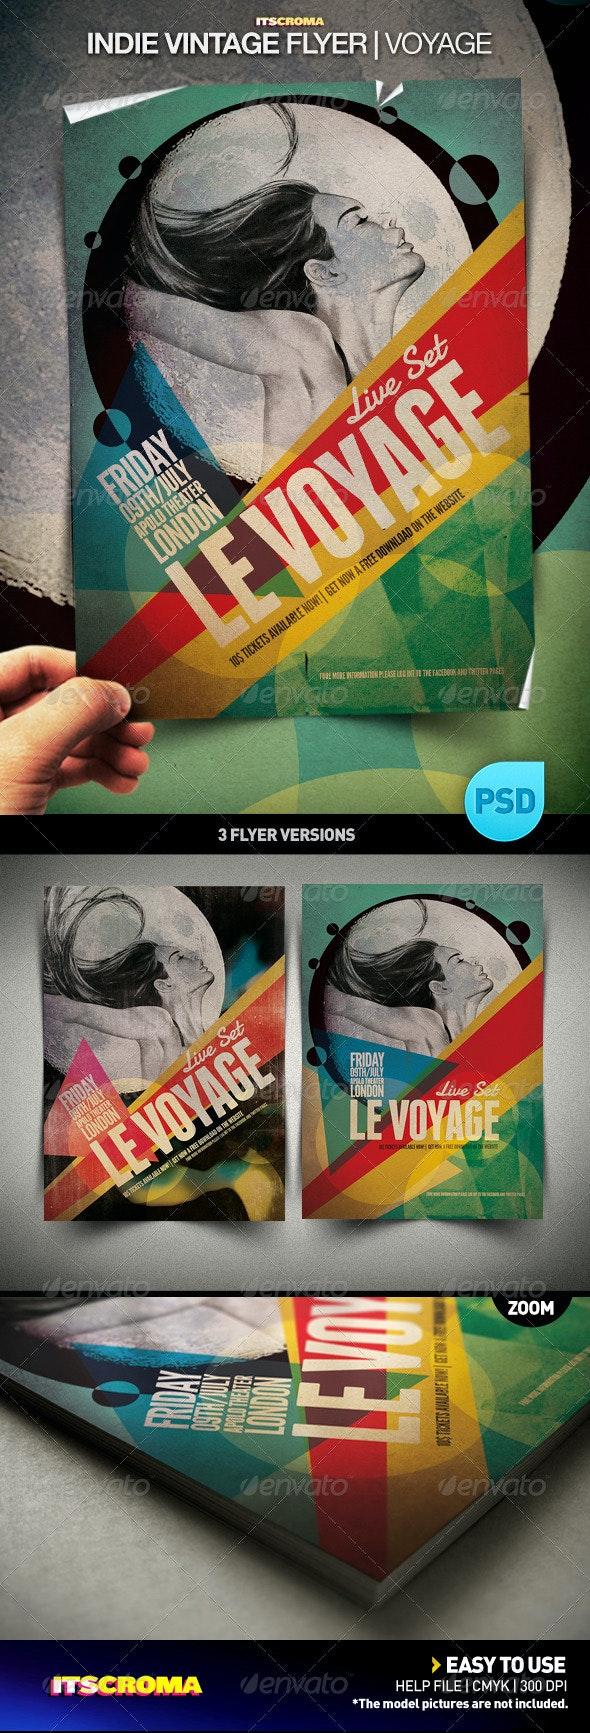 Indie Vintage Flyer 001 | Voyage - Concerts Events